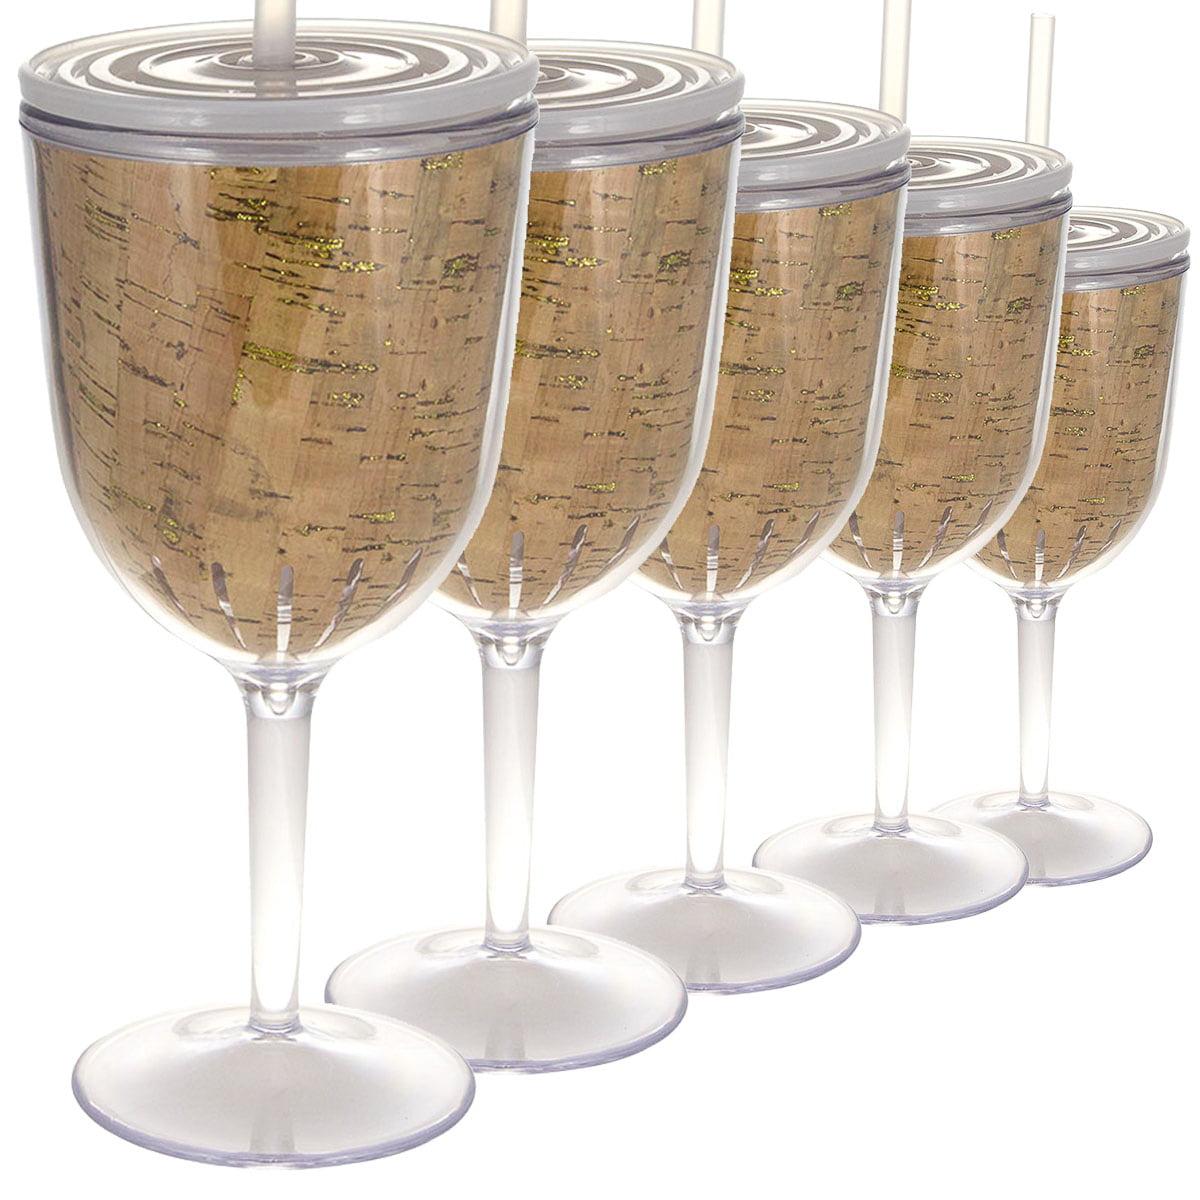 6ct Glitter Cork 13oz Wine Glasses With Lids Straw Double